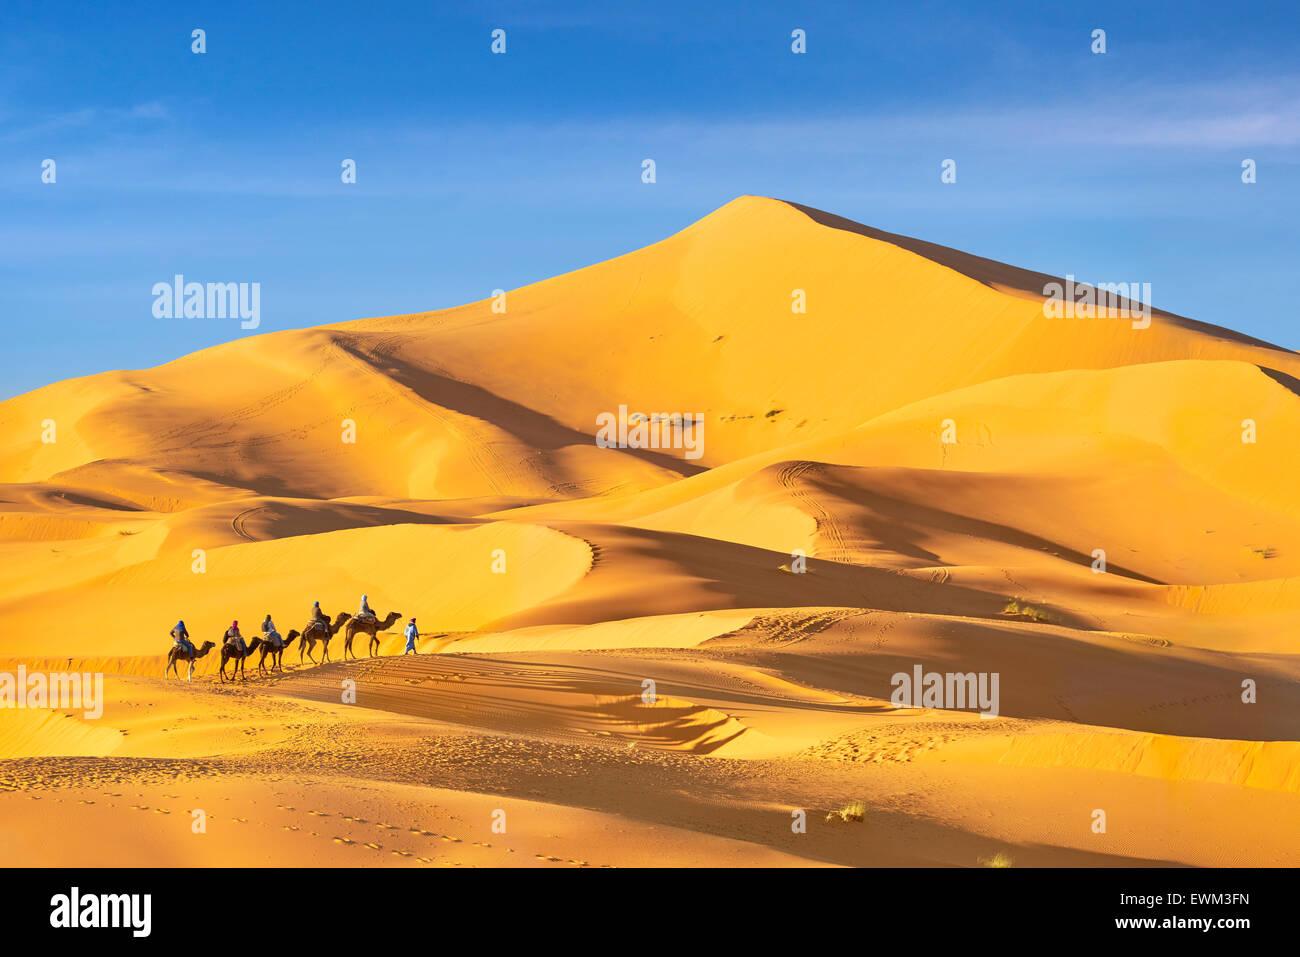 Los turistas paseo en camellos, Erg Chebbi desierto cerca de Merzouga, Sahara, Marruecos Imagen De Stock